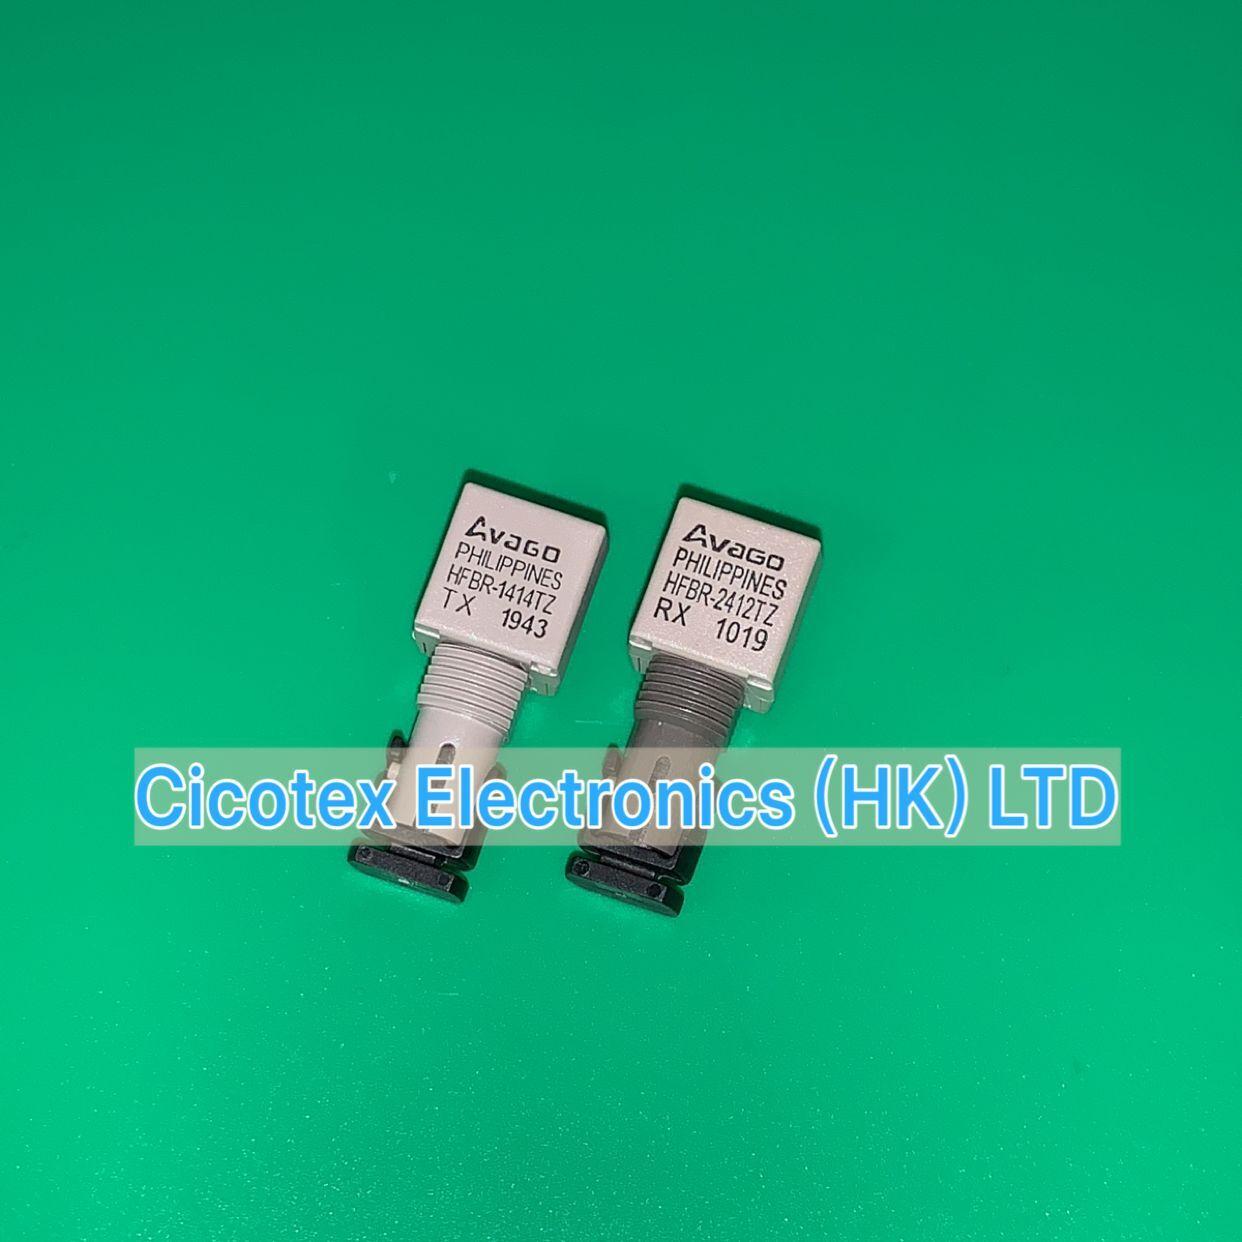 2pcs/pairs HFBR-1414TZ & HFBR-2412TZ ZIP-8 HFBR1414 XMITTER FIBER OPTIC HIGH PWR ST & HFBR2412 RECEIVER FIBER OPTIC 5MBD TTL ST